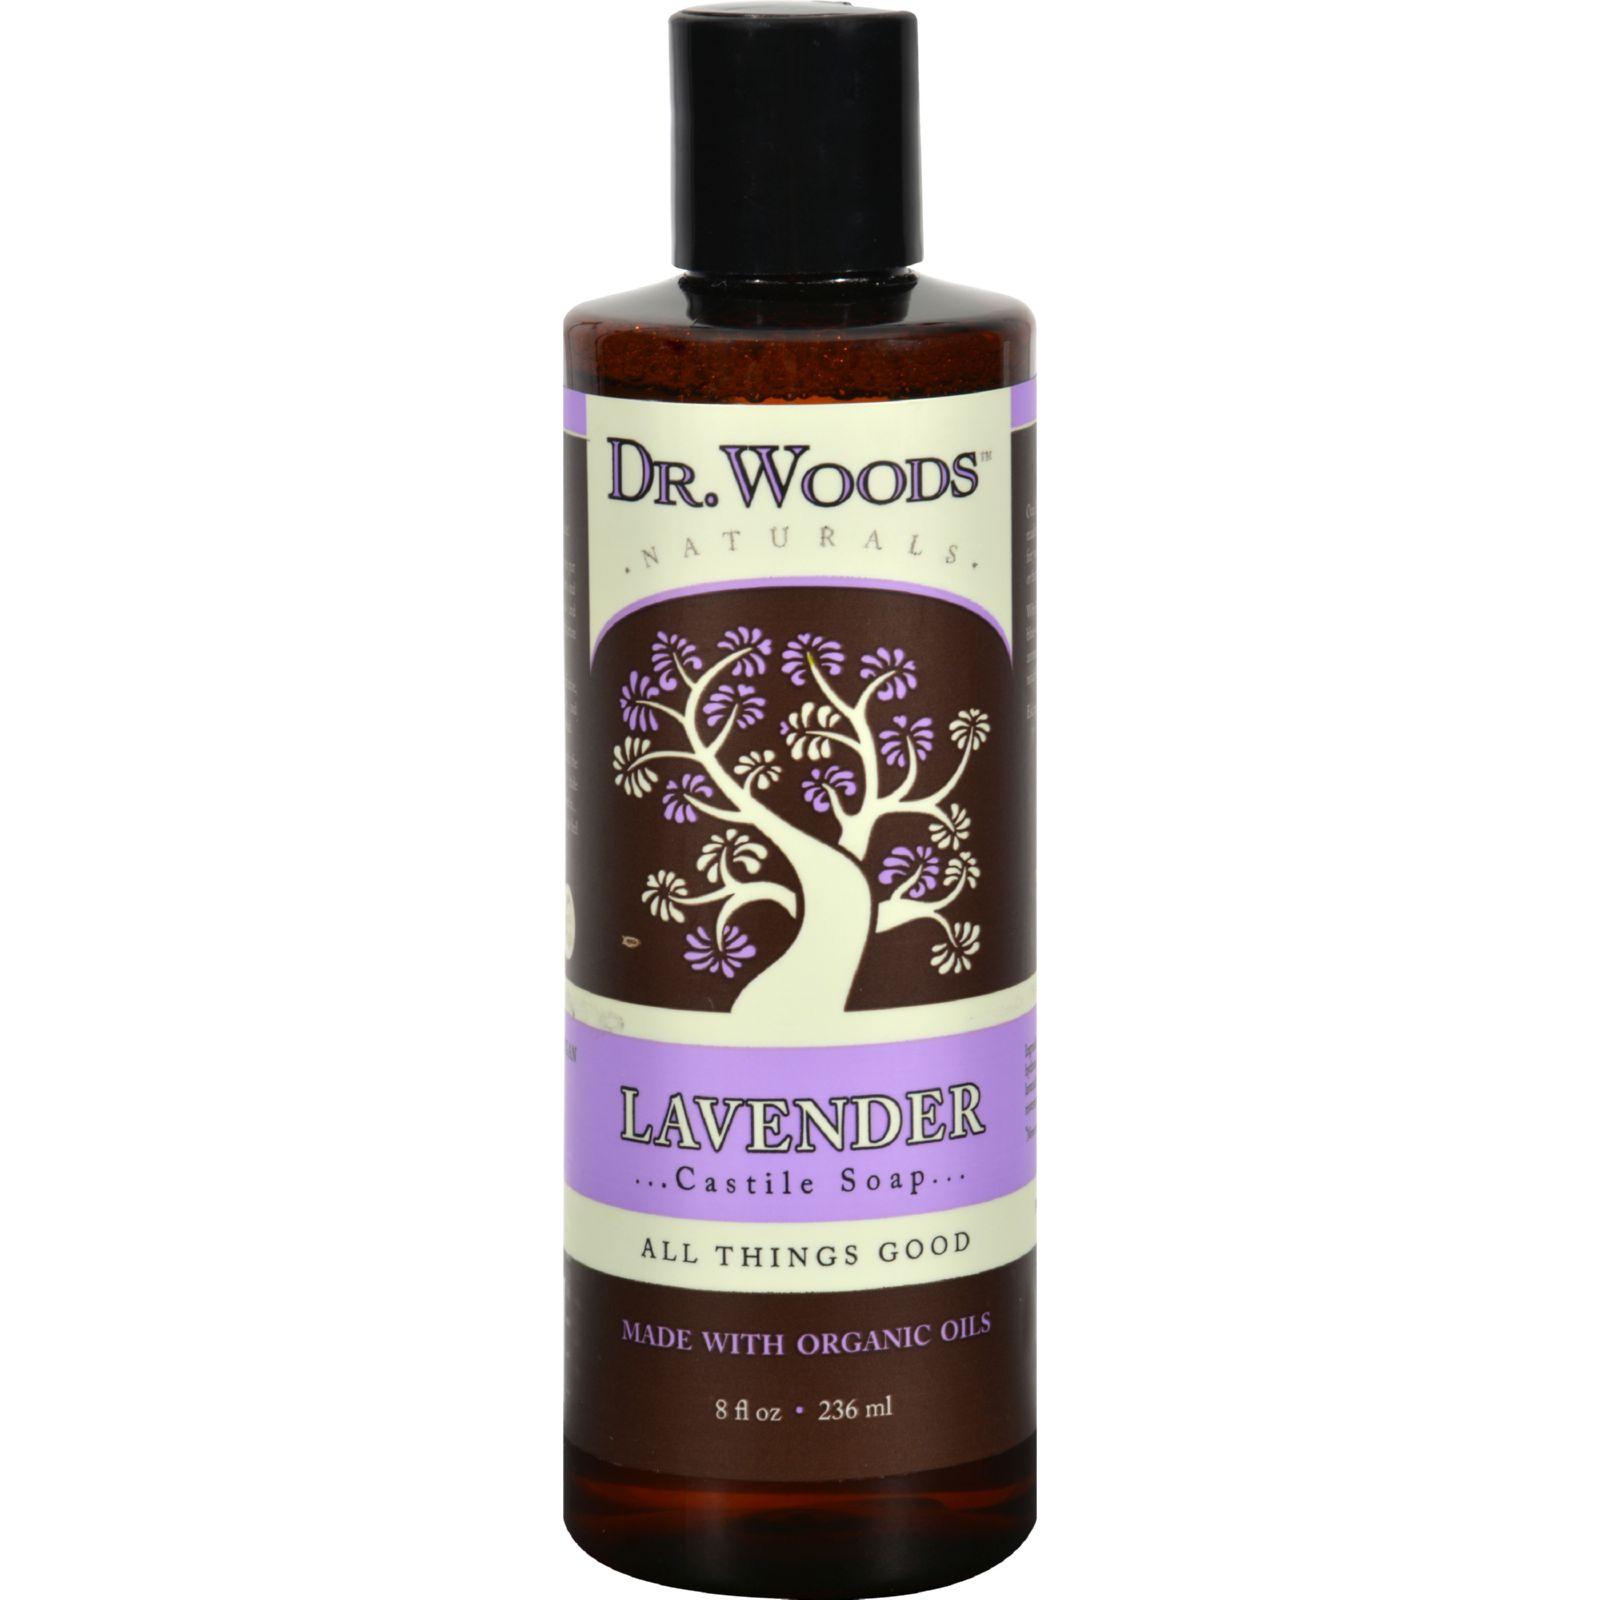 Dr. Woods Naturals Castile Liquid Soap - Lavender - 8 fl oz